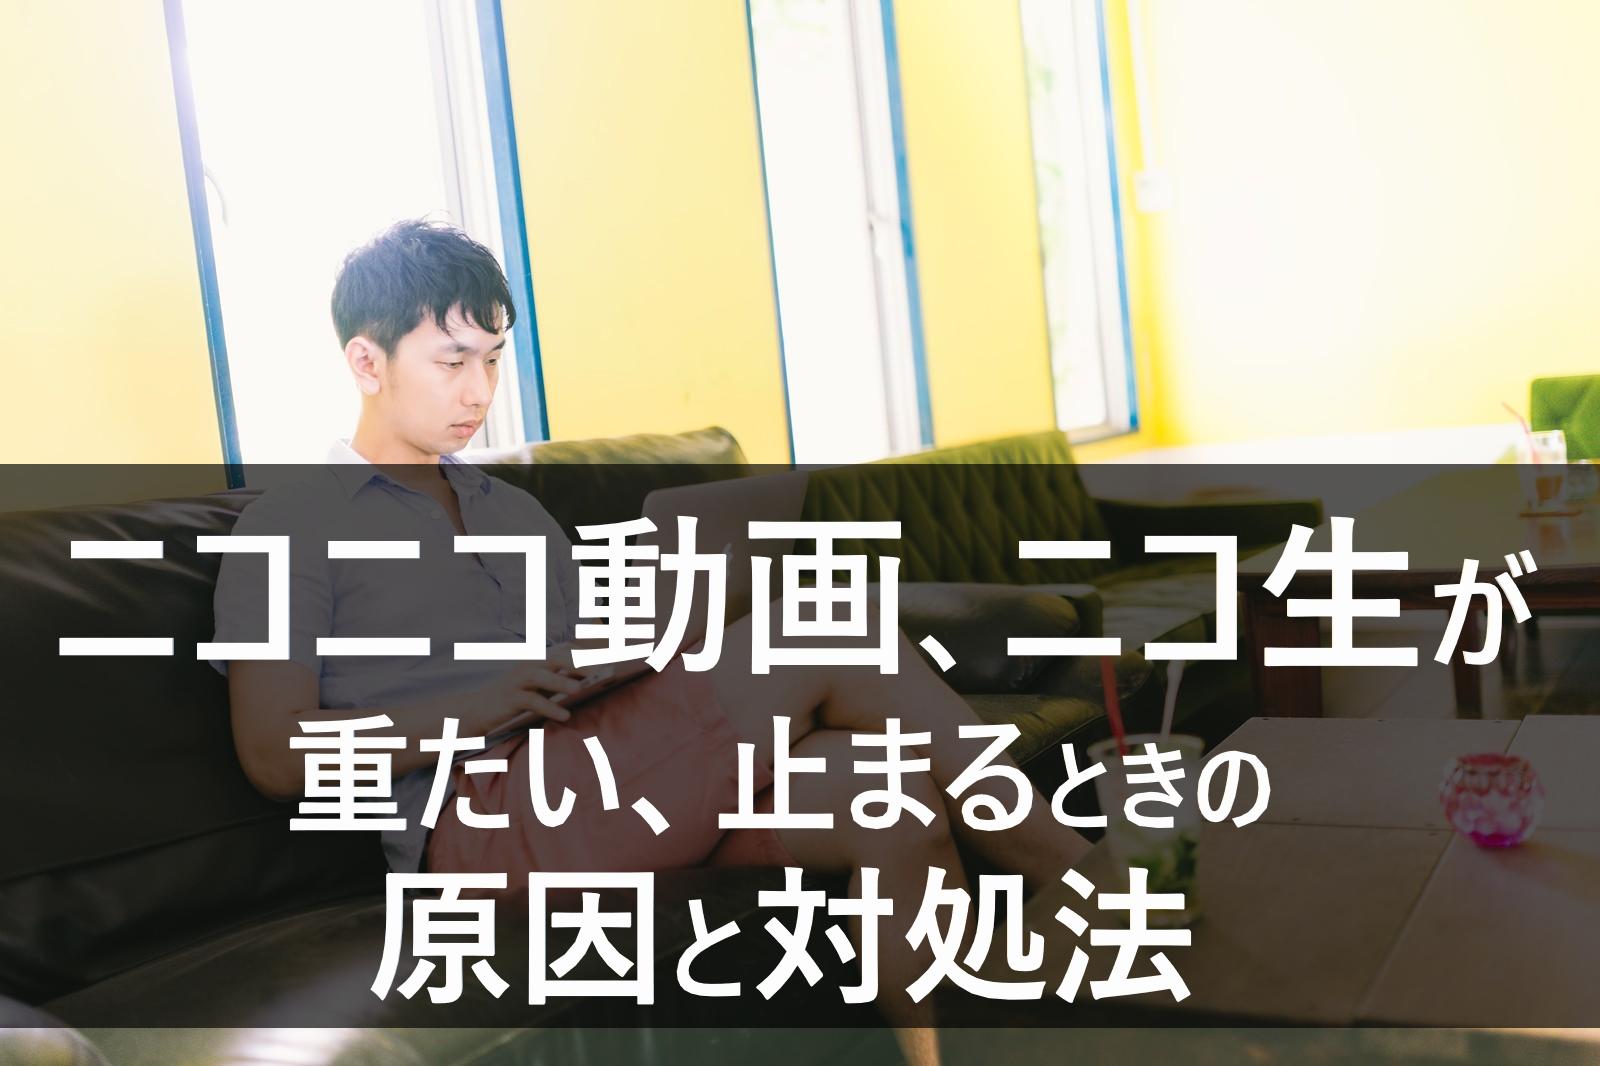 ニコニコ動画ニコ生